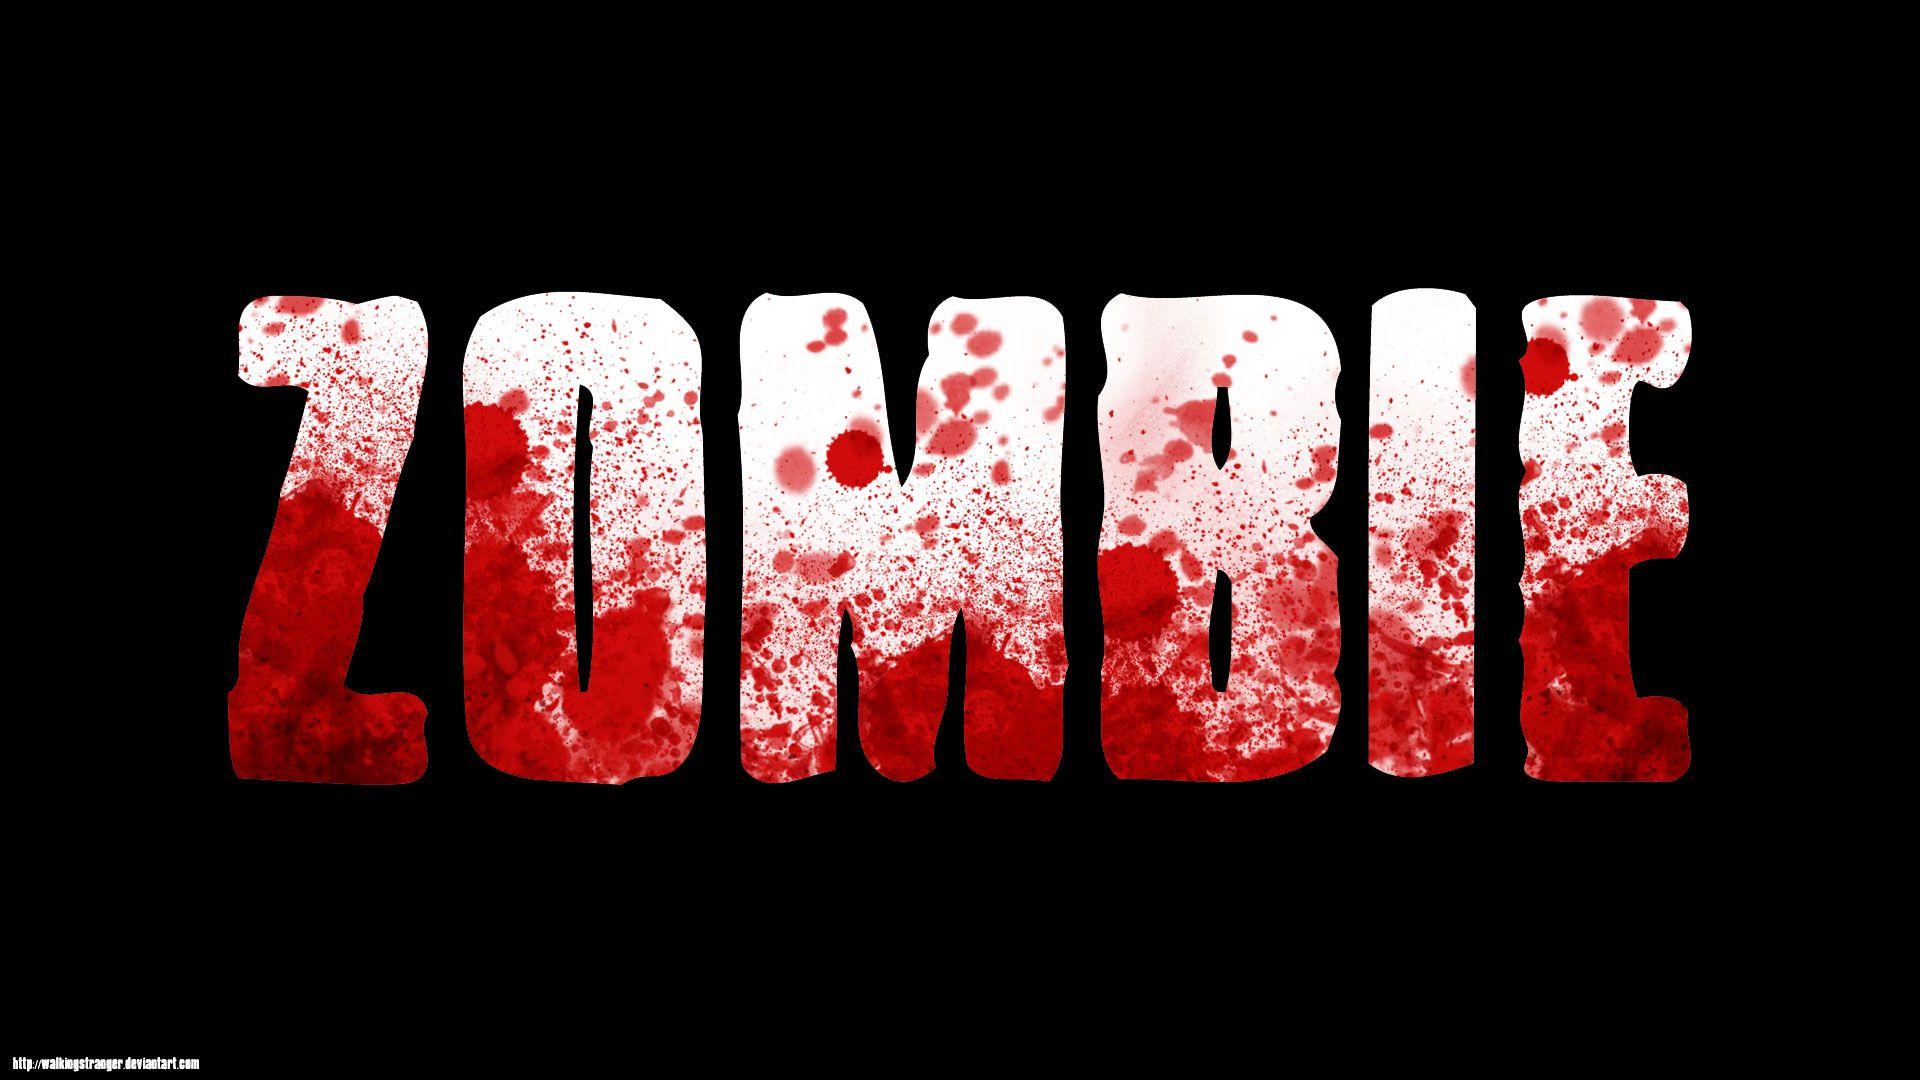 Zombie Wallpaper Zombie Wallpaper Zombie Dead Zombie